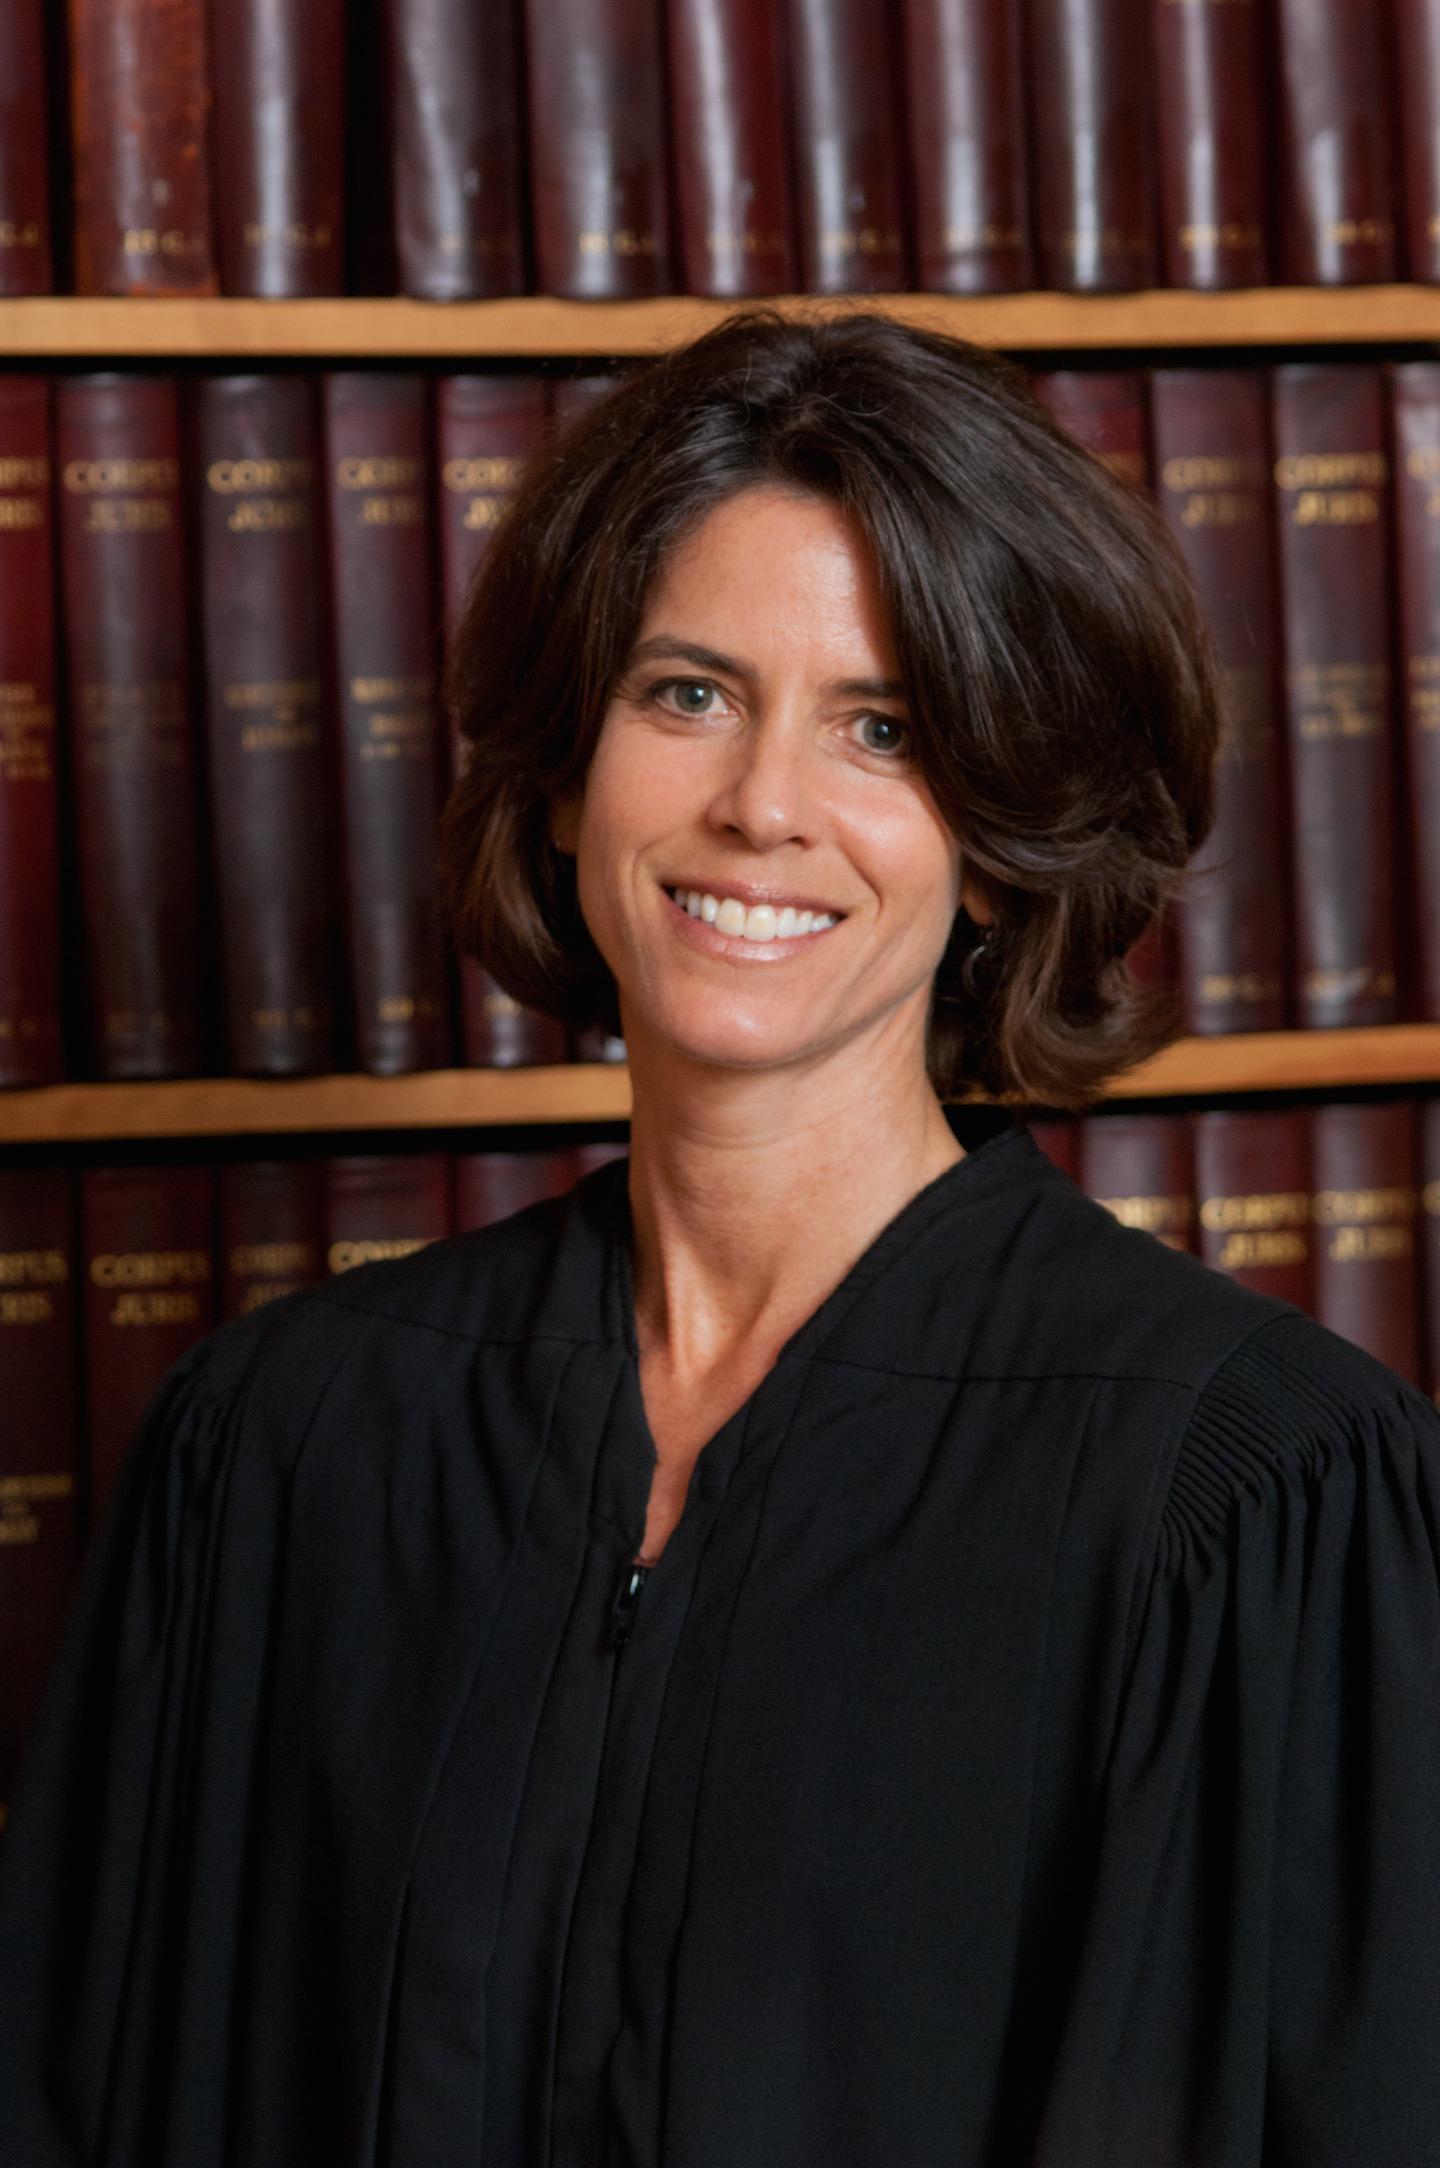 Justice Nadeau